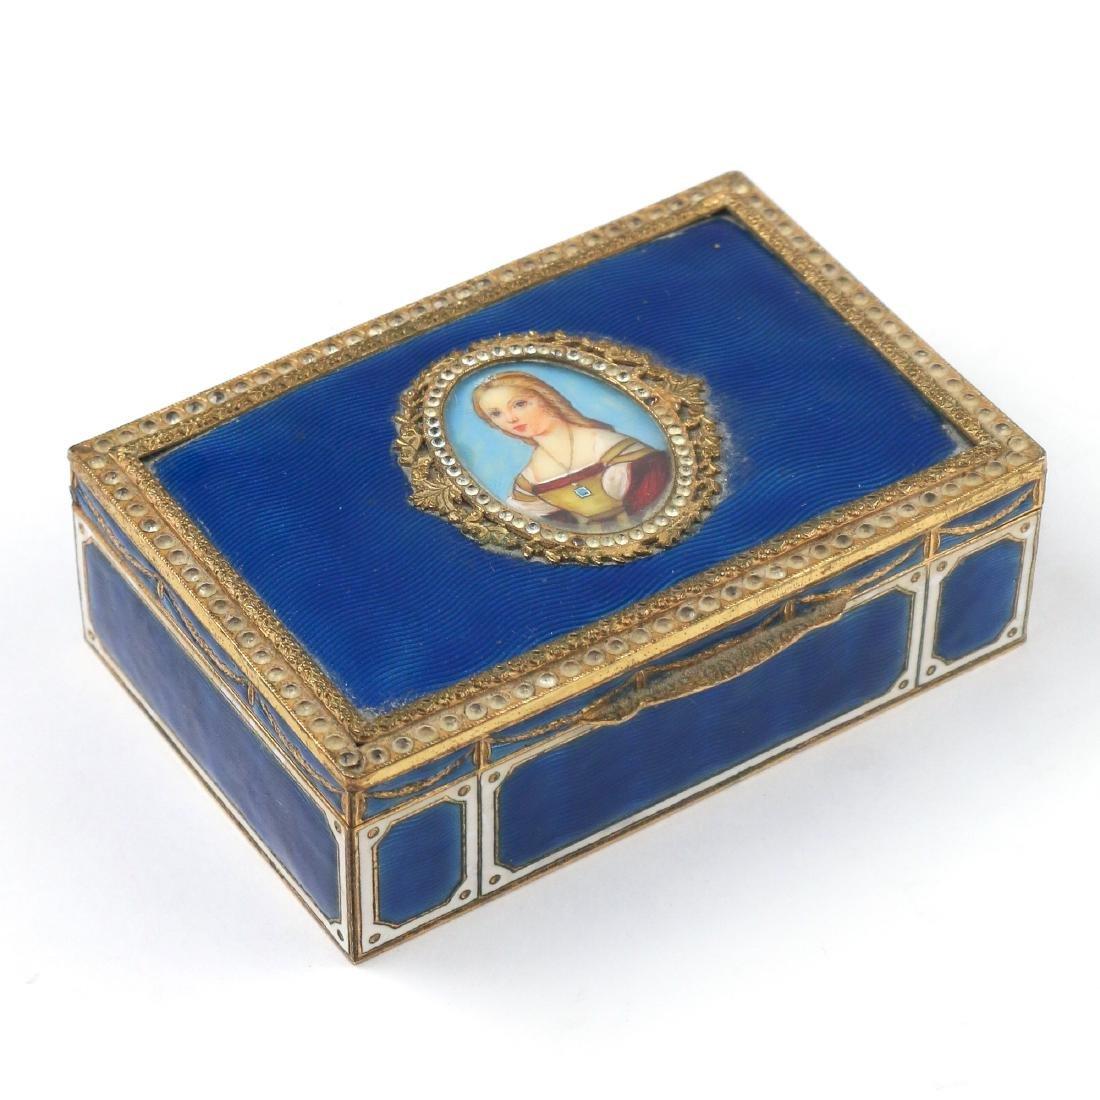 GUILLOCHE ENAMEL BOX